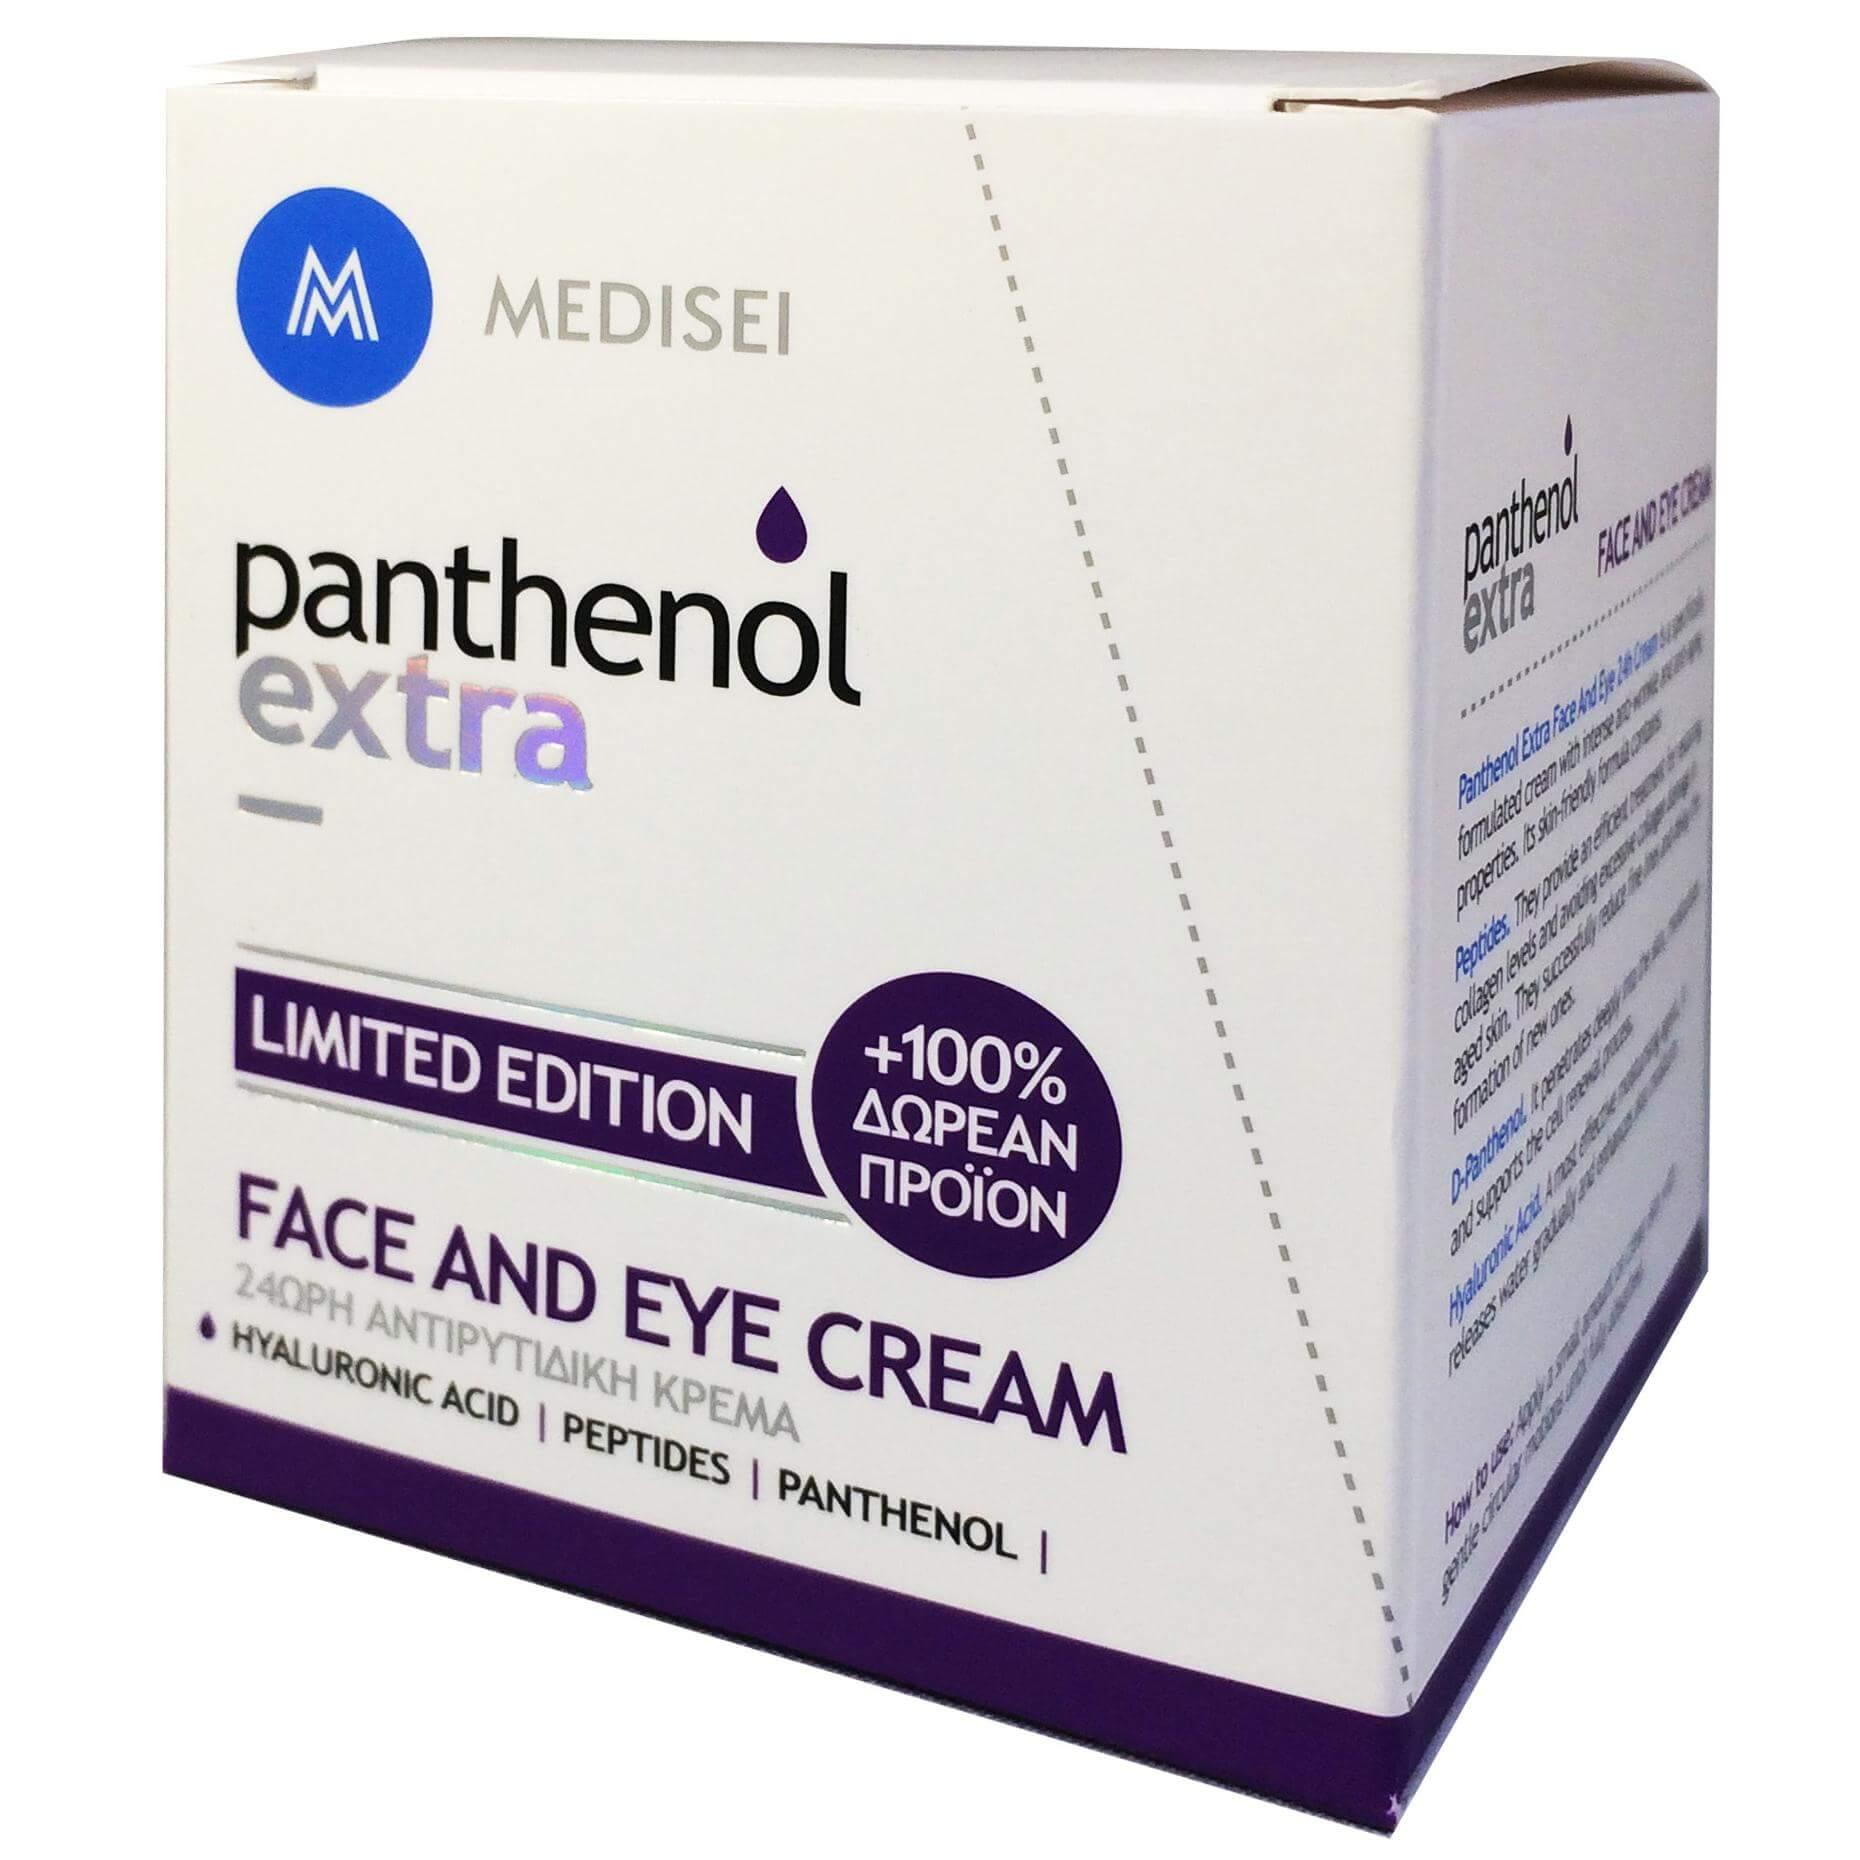 Medisei Panthenol Extra Face And Eye Limited Edition 24ωρη Αντιρυτιδική Κρέμα με Υαλουρονικό Οξύ 100ml